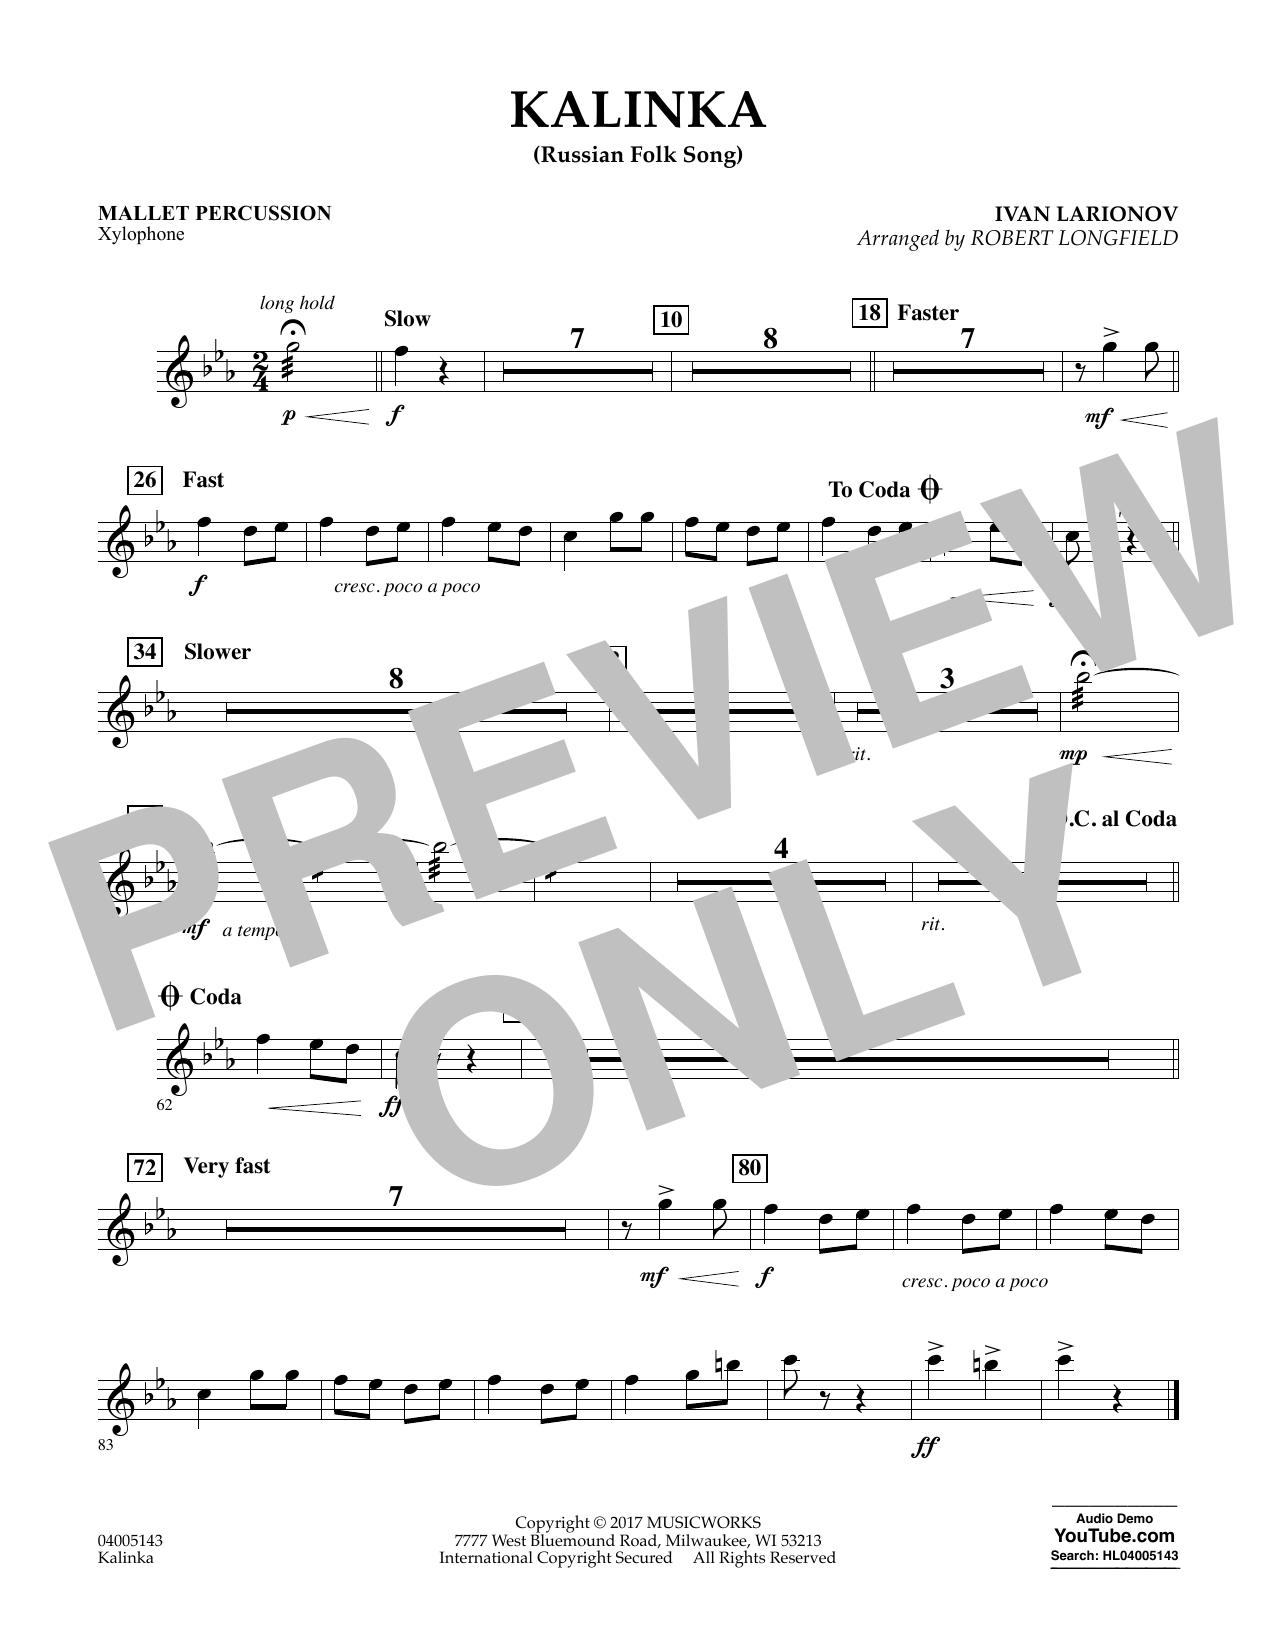 Kalinka (Russian Folk Song) - Mallet Percussion (Concert Band)